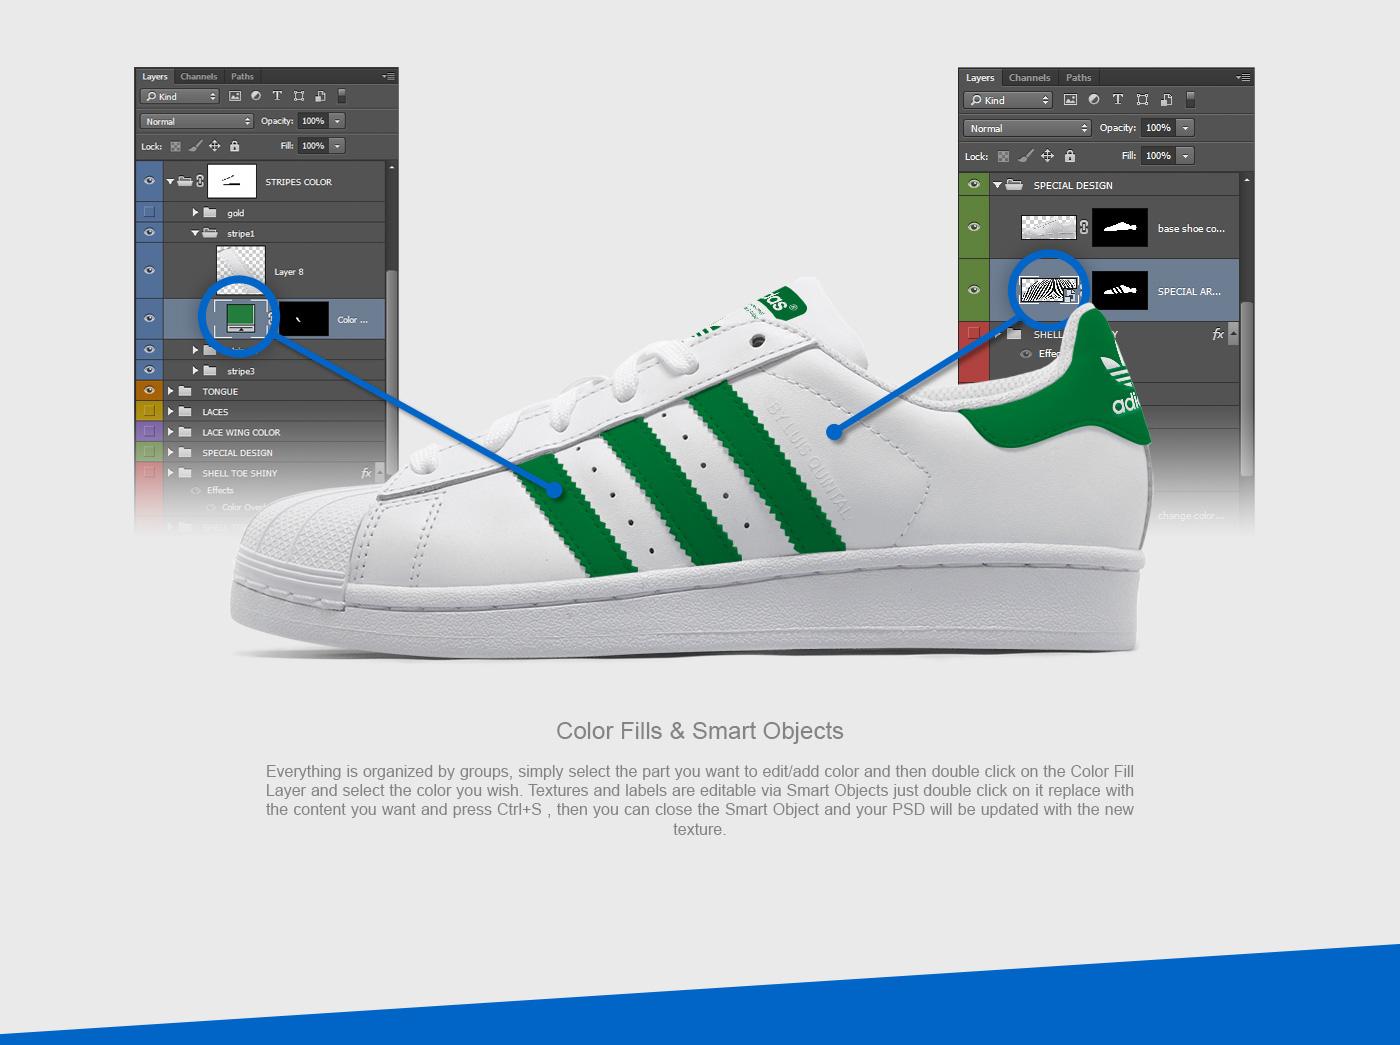 adidas,superstar,shellshoes,adicolor,stansmith,adidas originals,Mockup,free mockup ,free psd,psd,photoshop file,download,apparel,sneakers